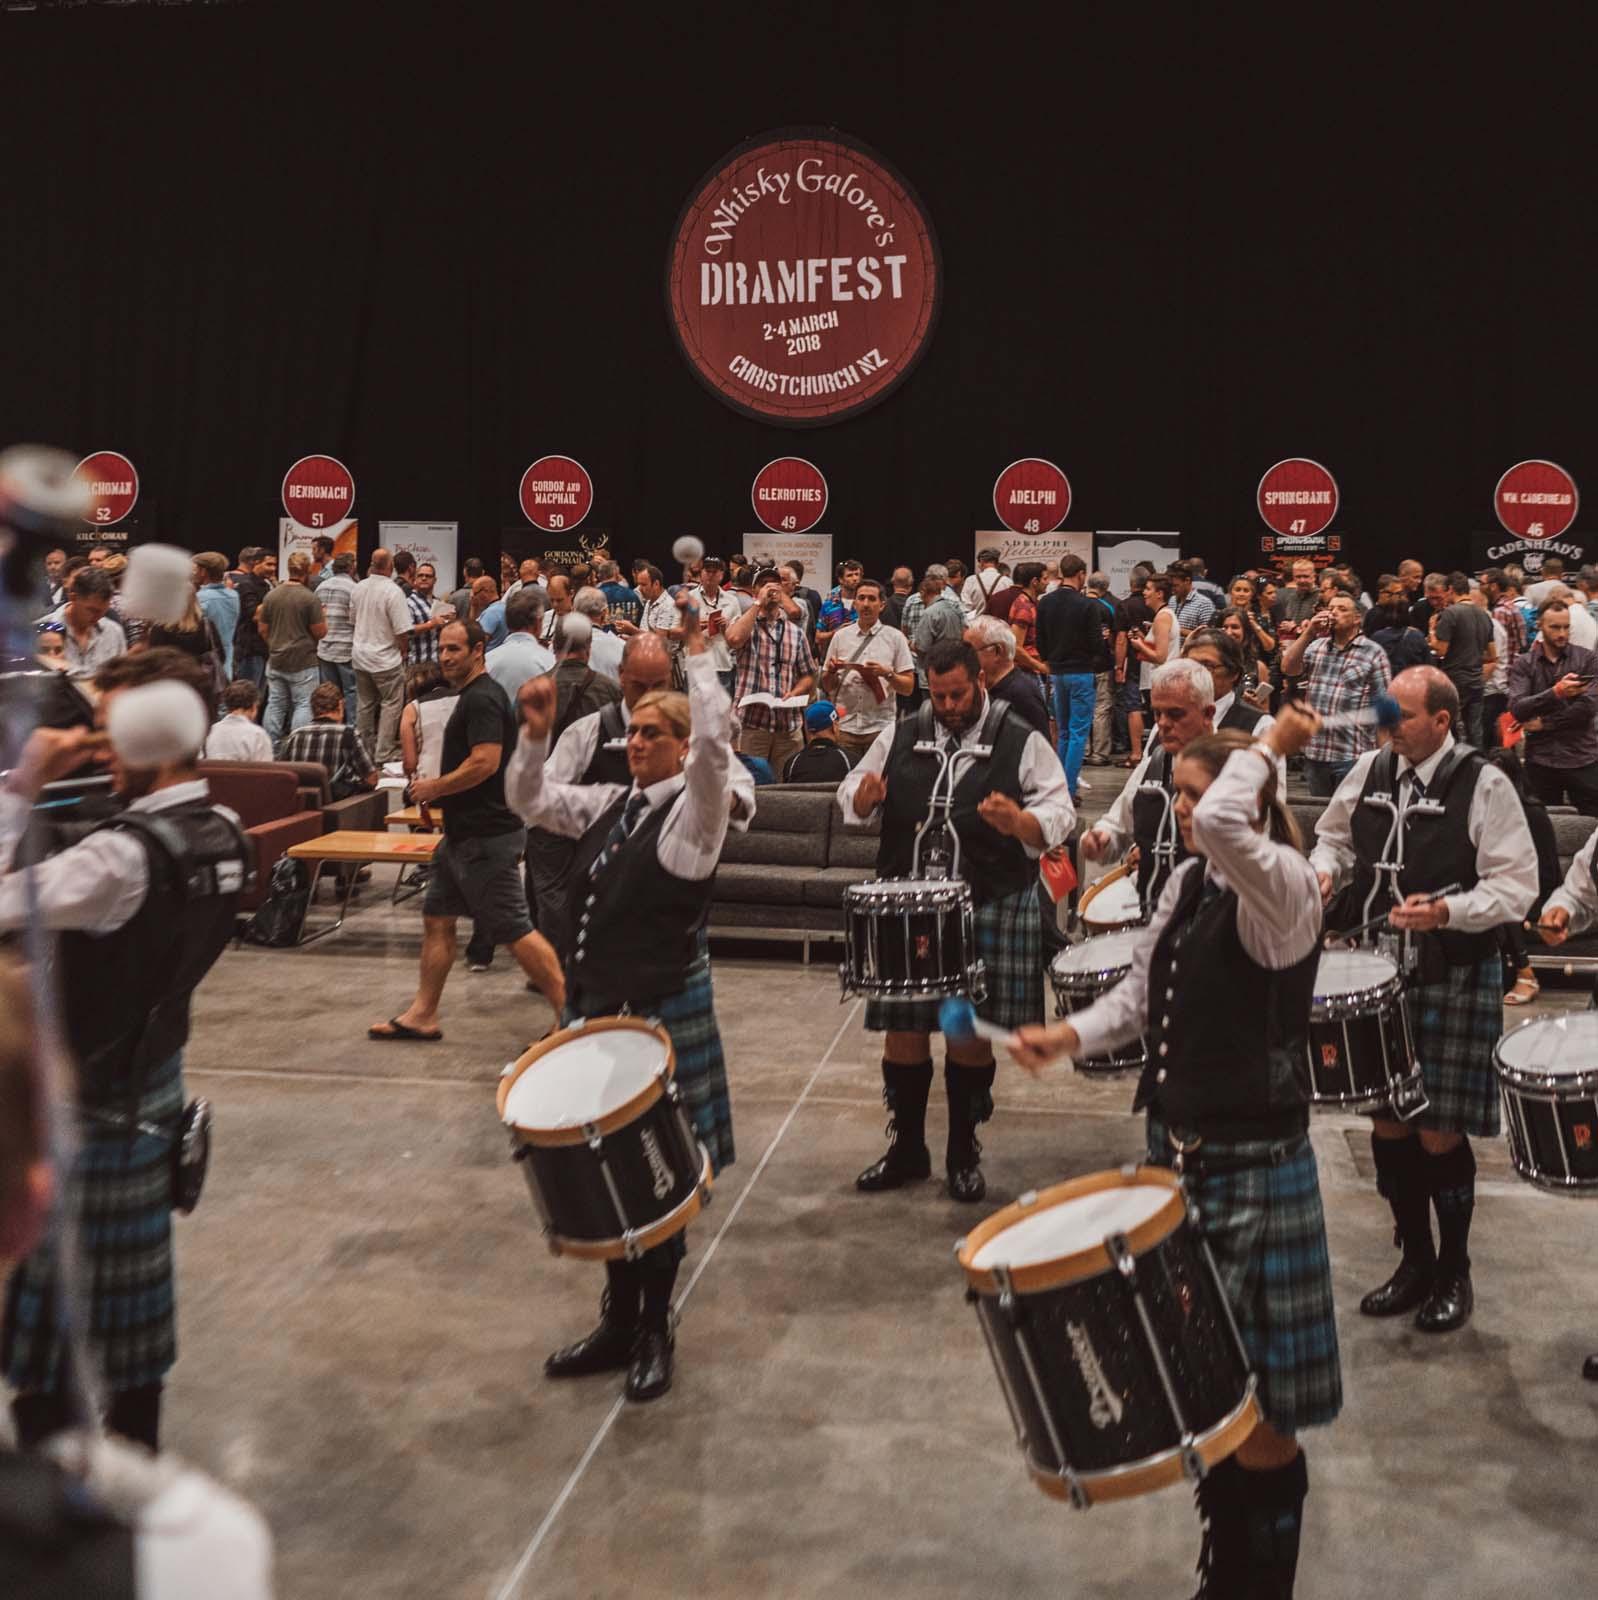 Dramfest 2018 for Whisky Galore-400.jpg